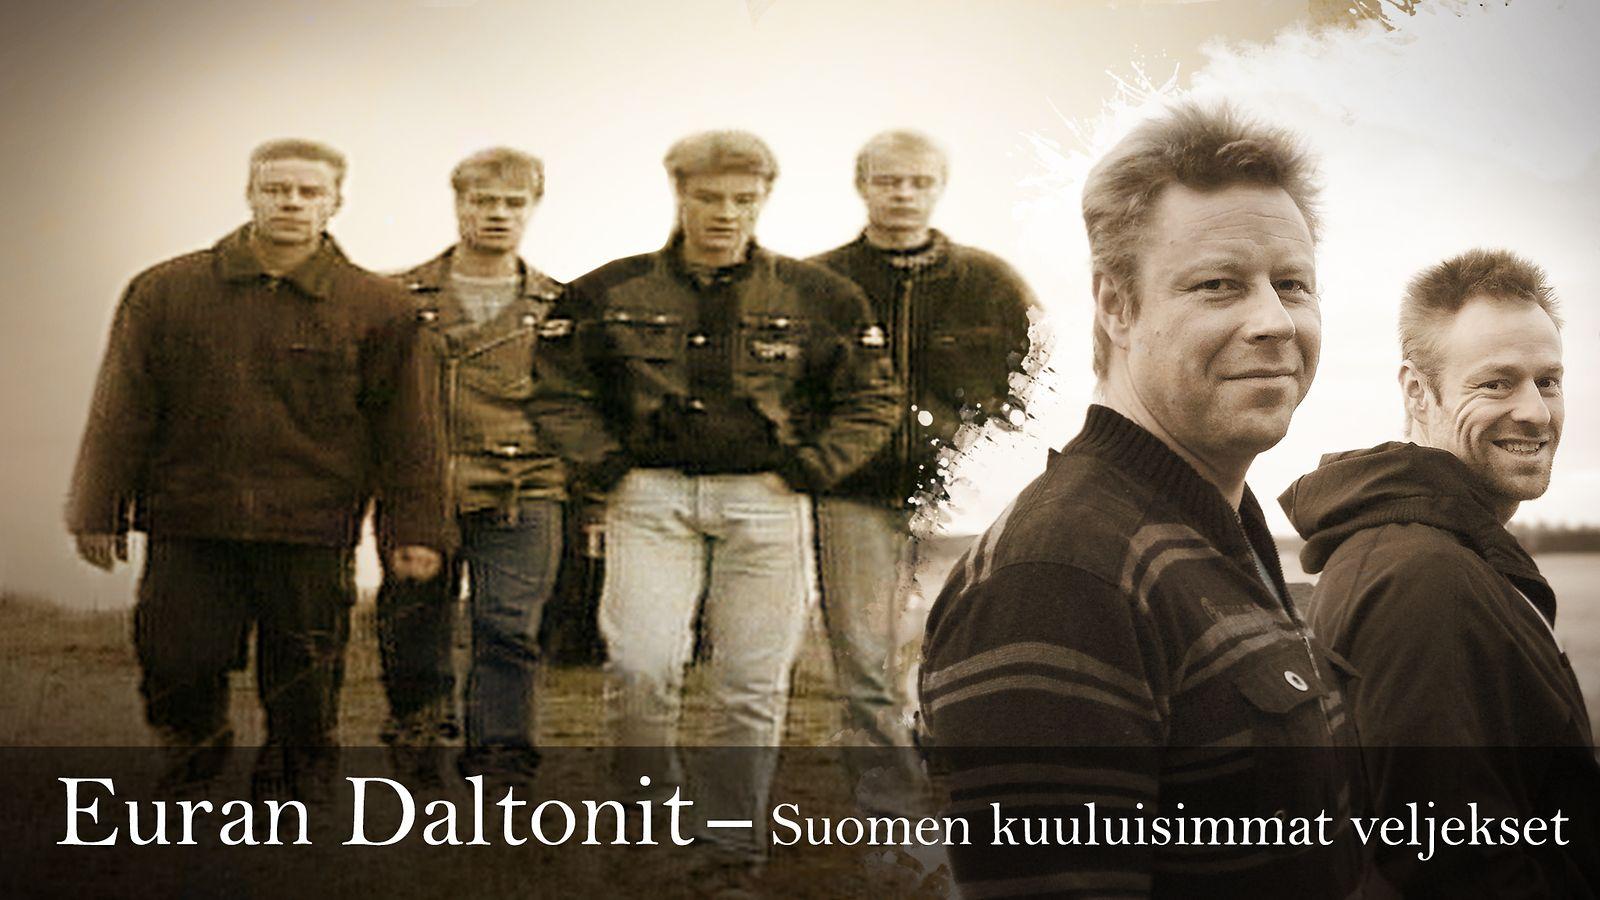 Euran Daltonit